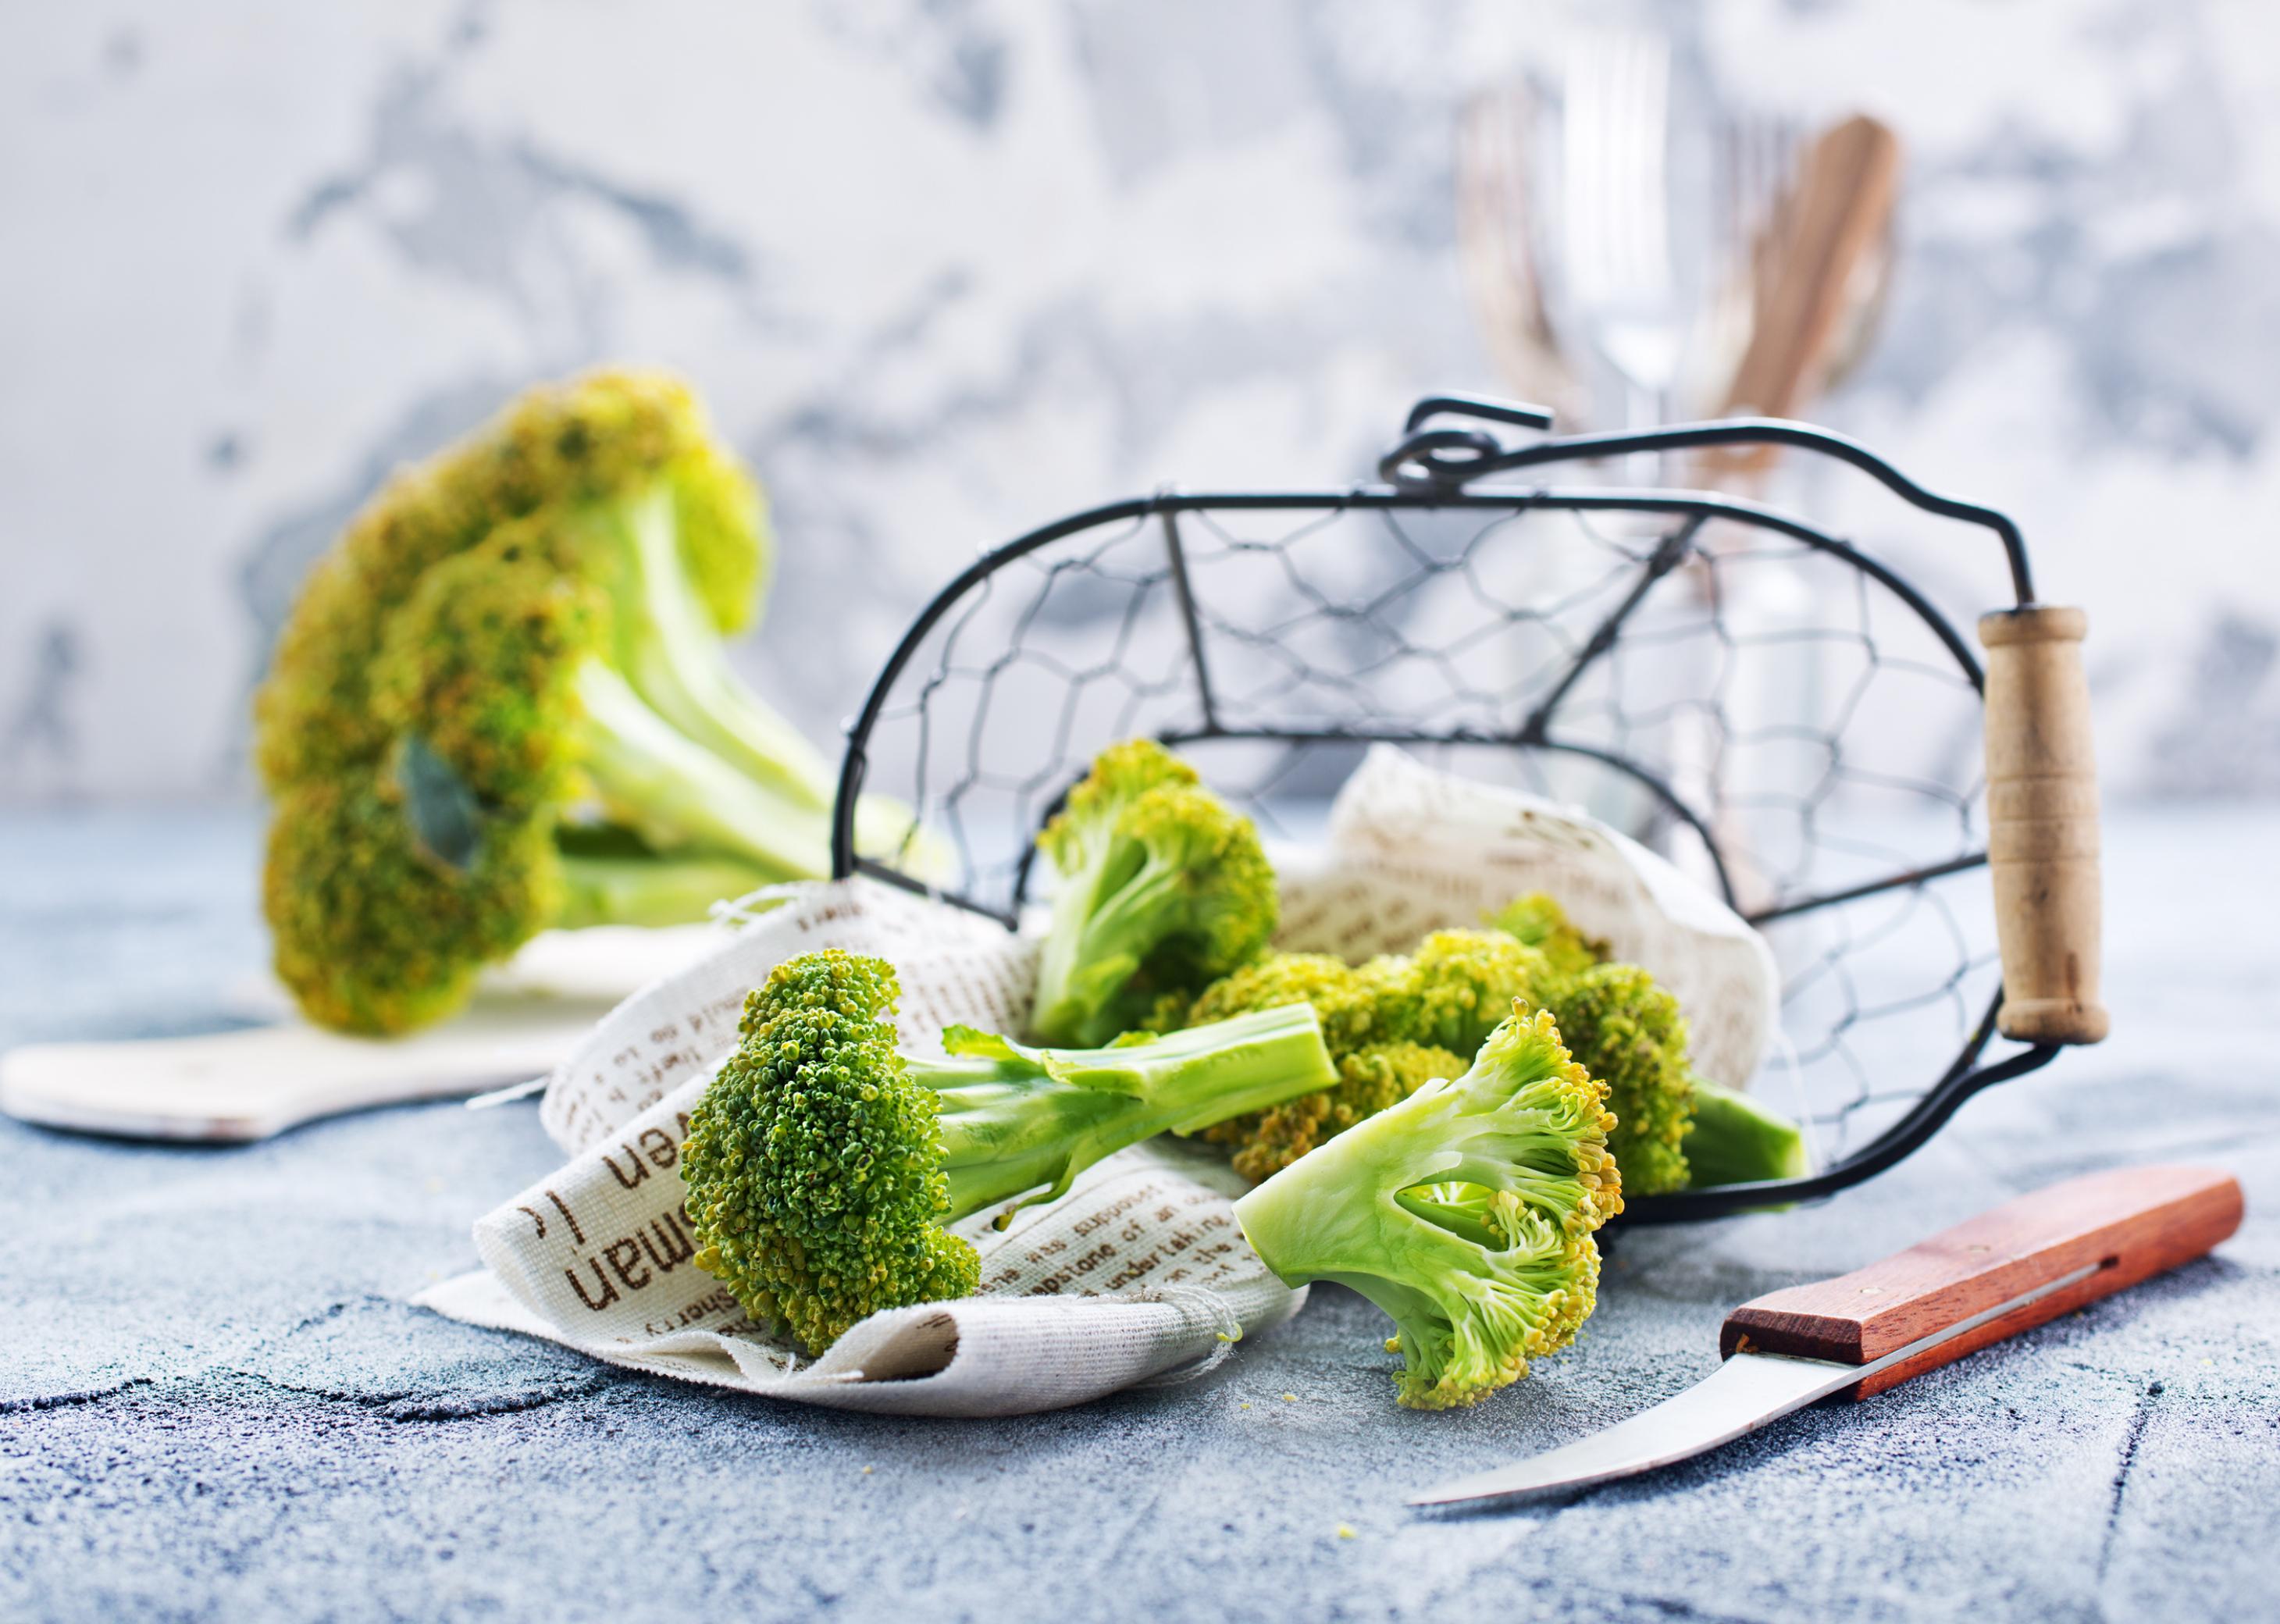 Broccoli | Citrus Fruits and Vegetables